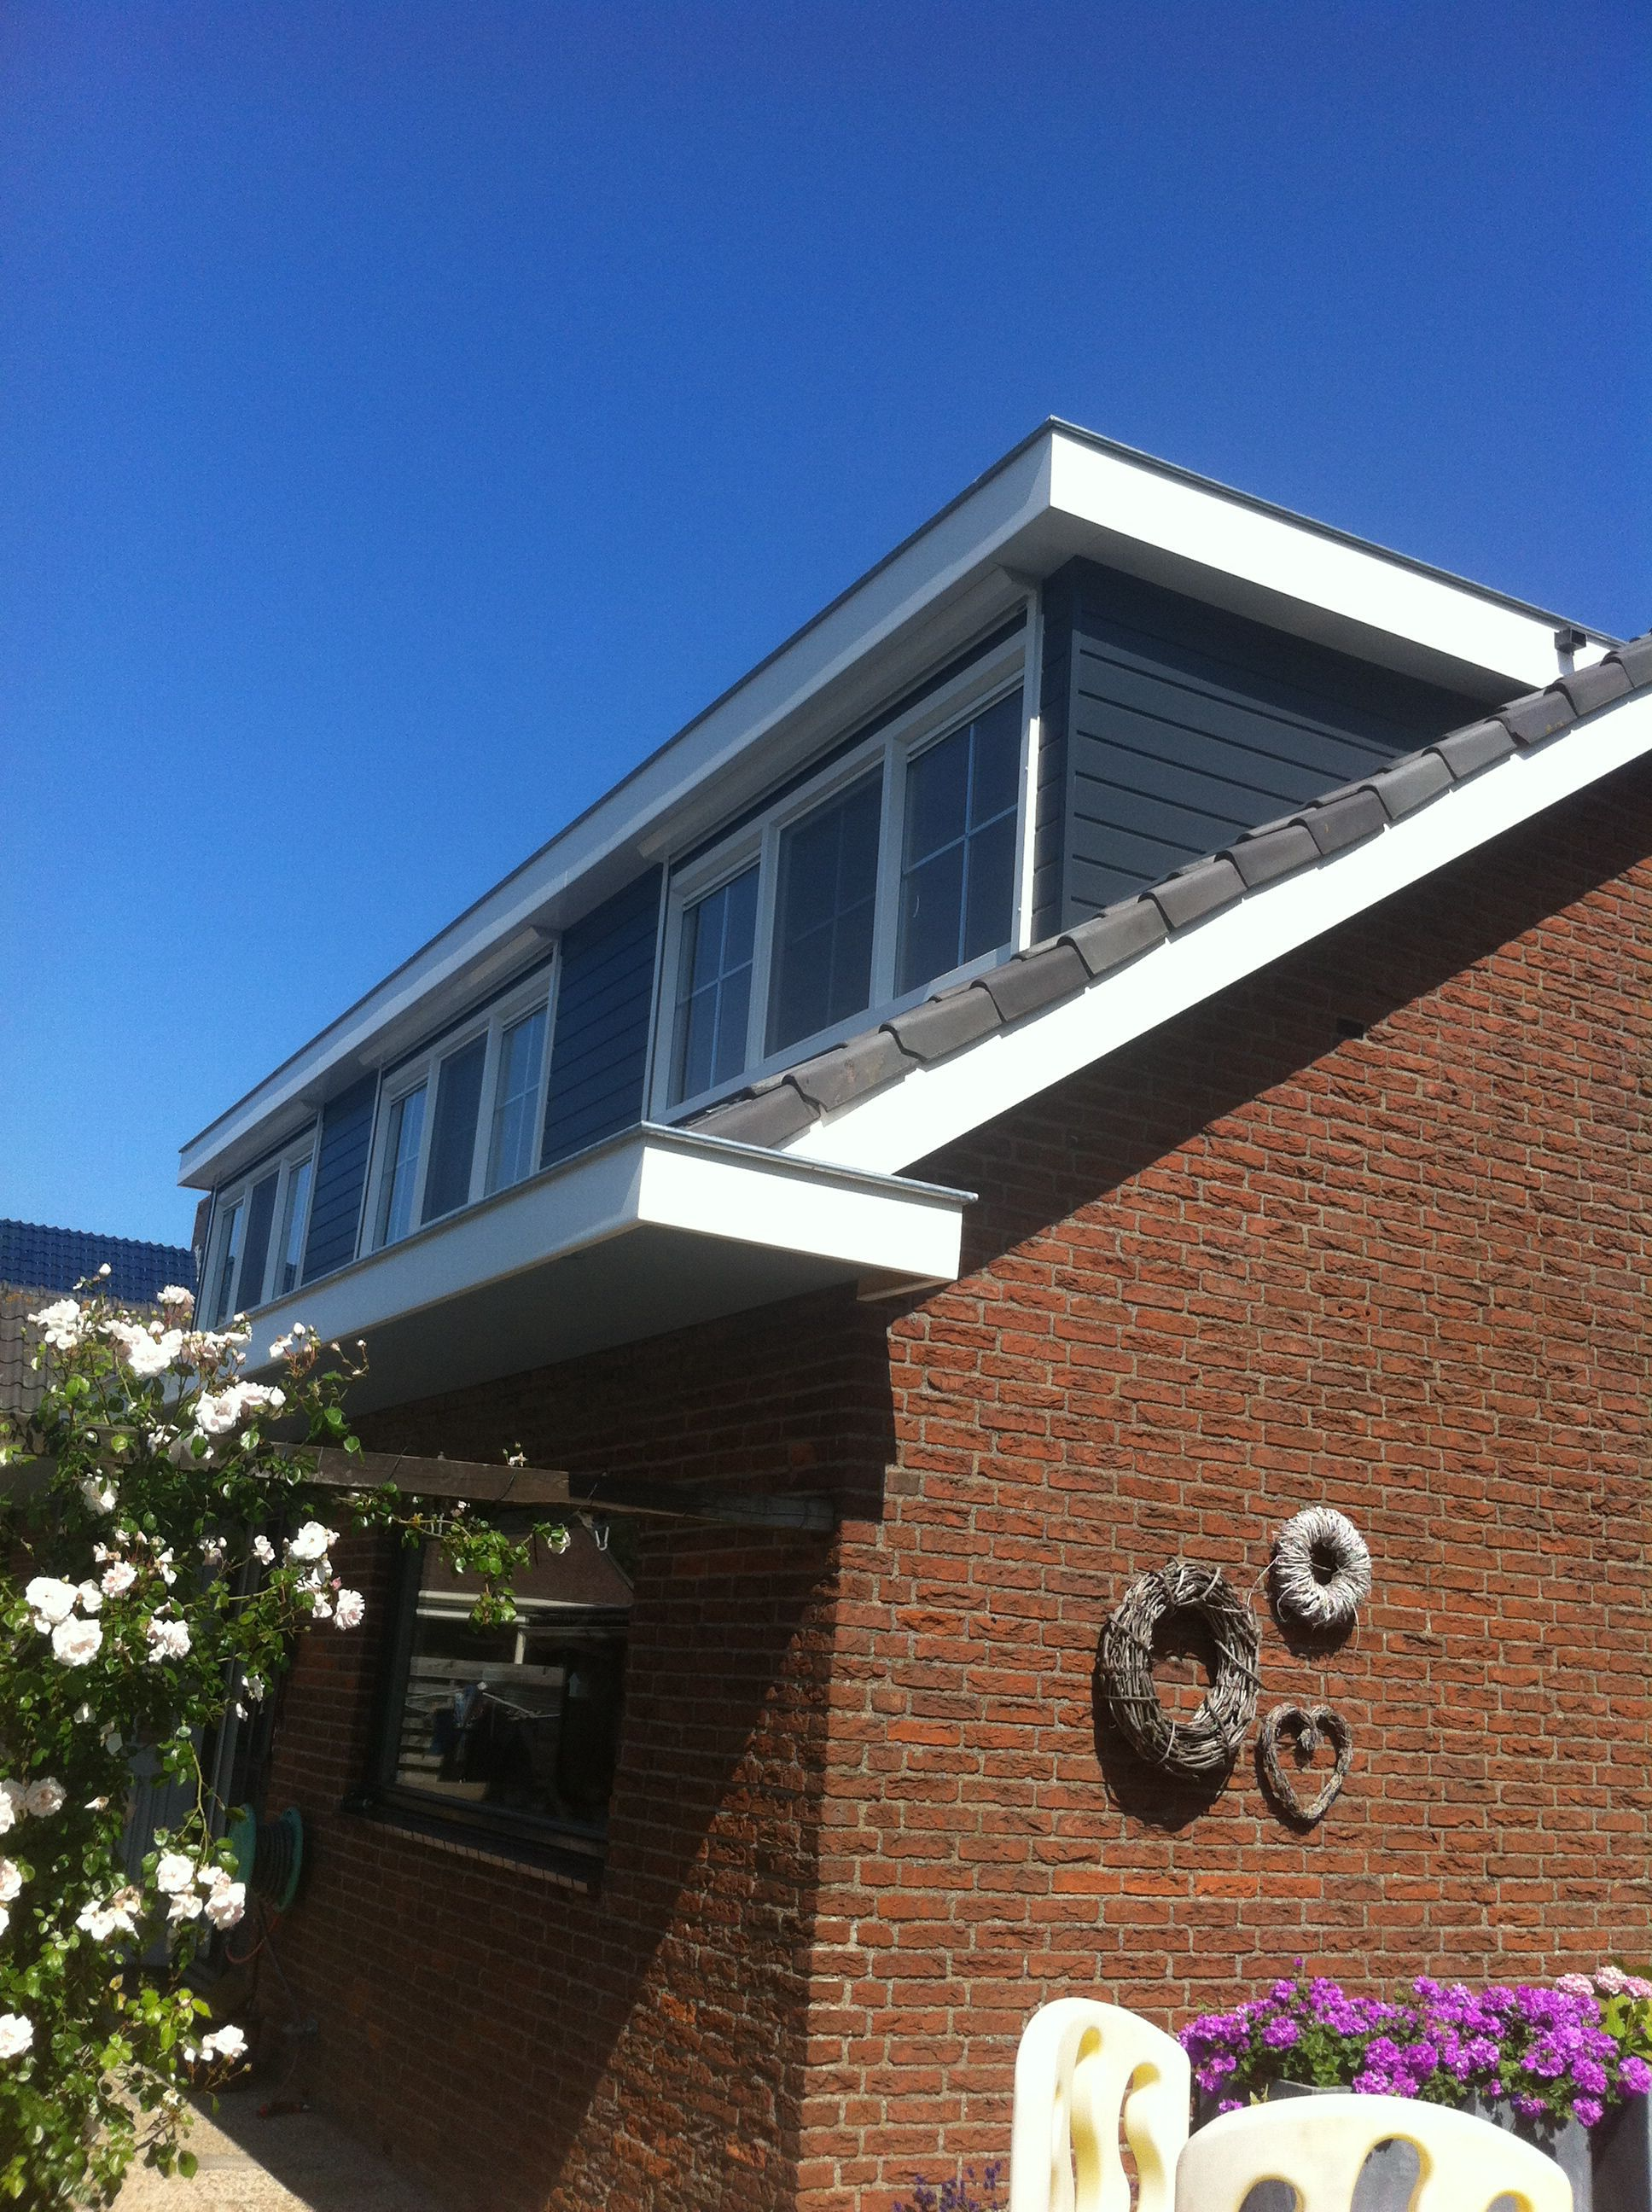 Kompaktes Ziegelhaus mit Erdwärmepumpe - Neubau - Hausideen, so ...